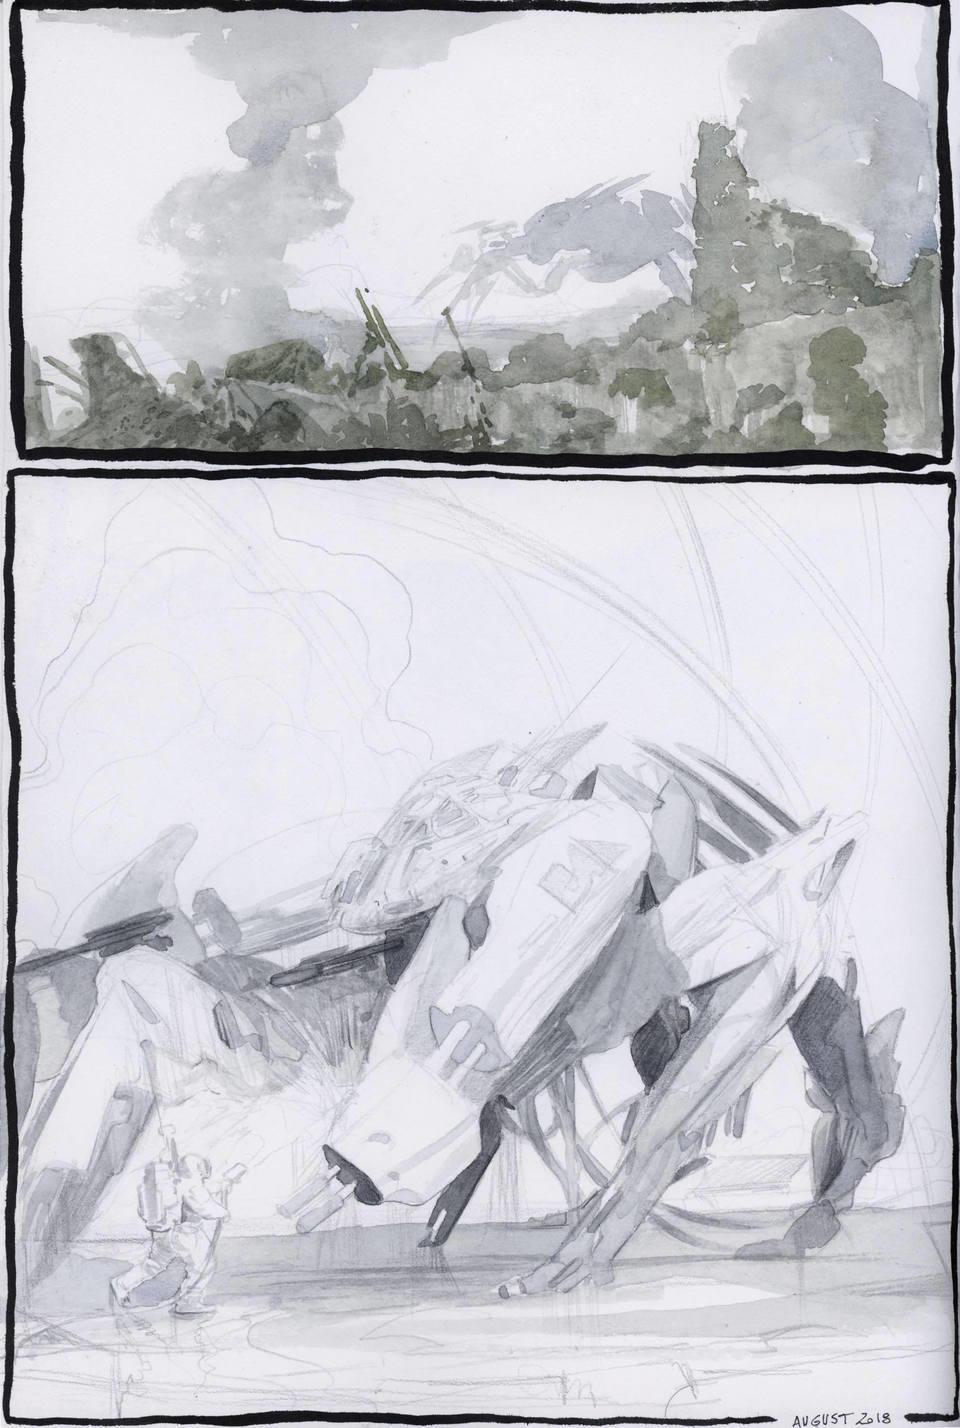 Mecha Decontamination, from sketchbook